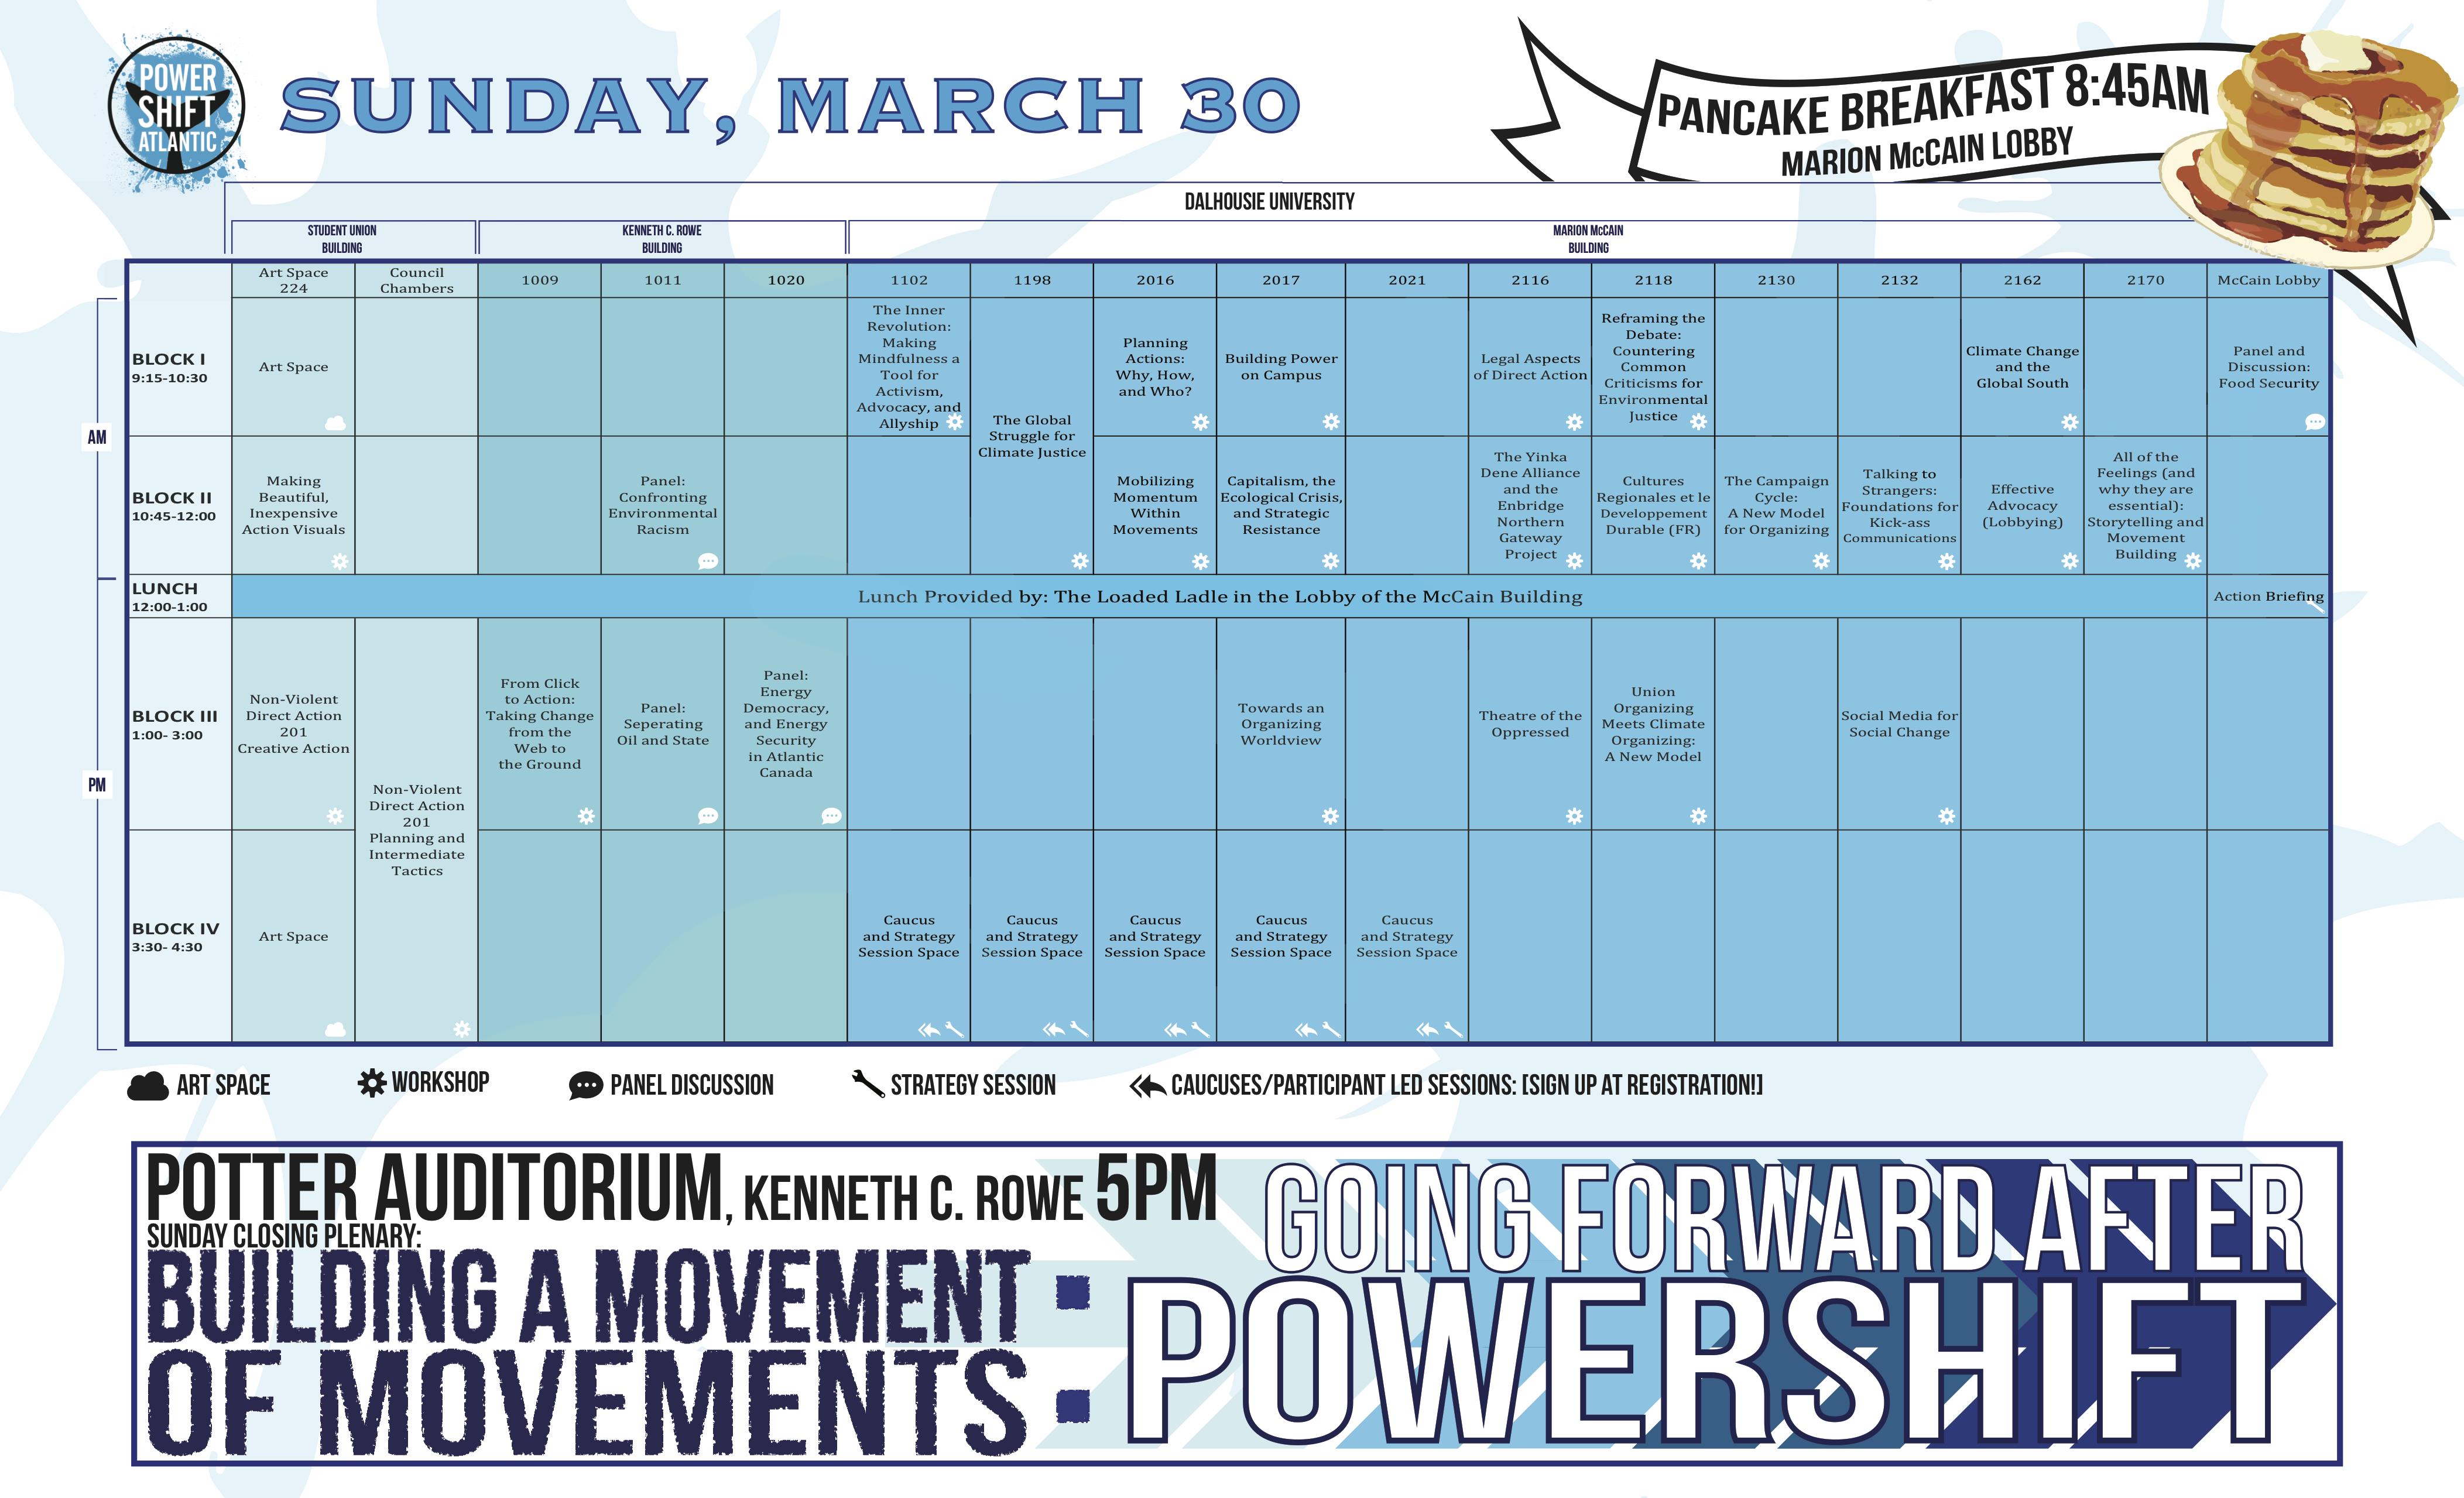 Sunday_Schedule_Matrix__Powershift_Atlantic_2014_(1).jpg